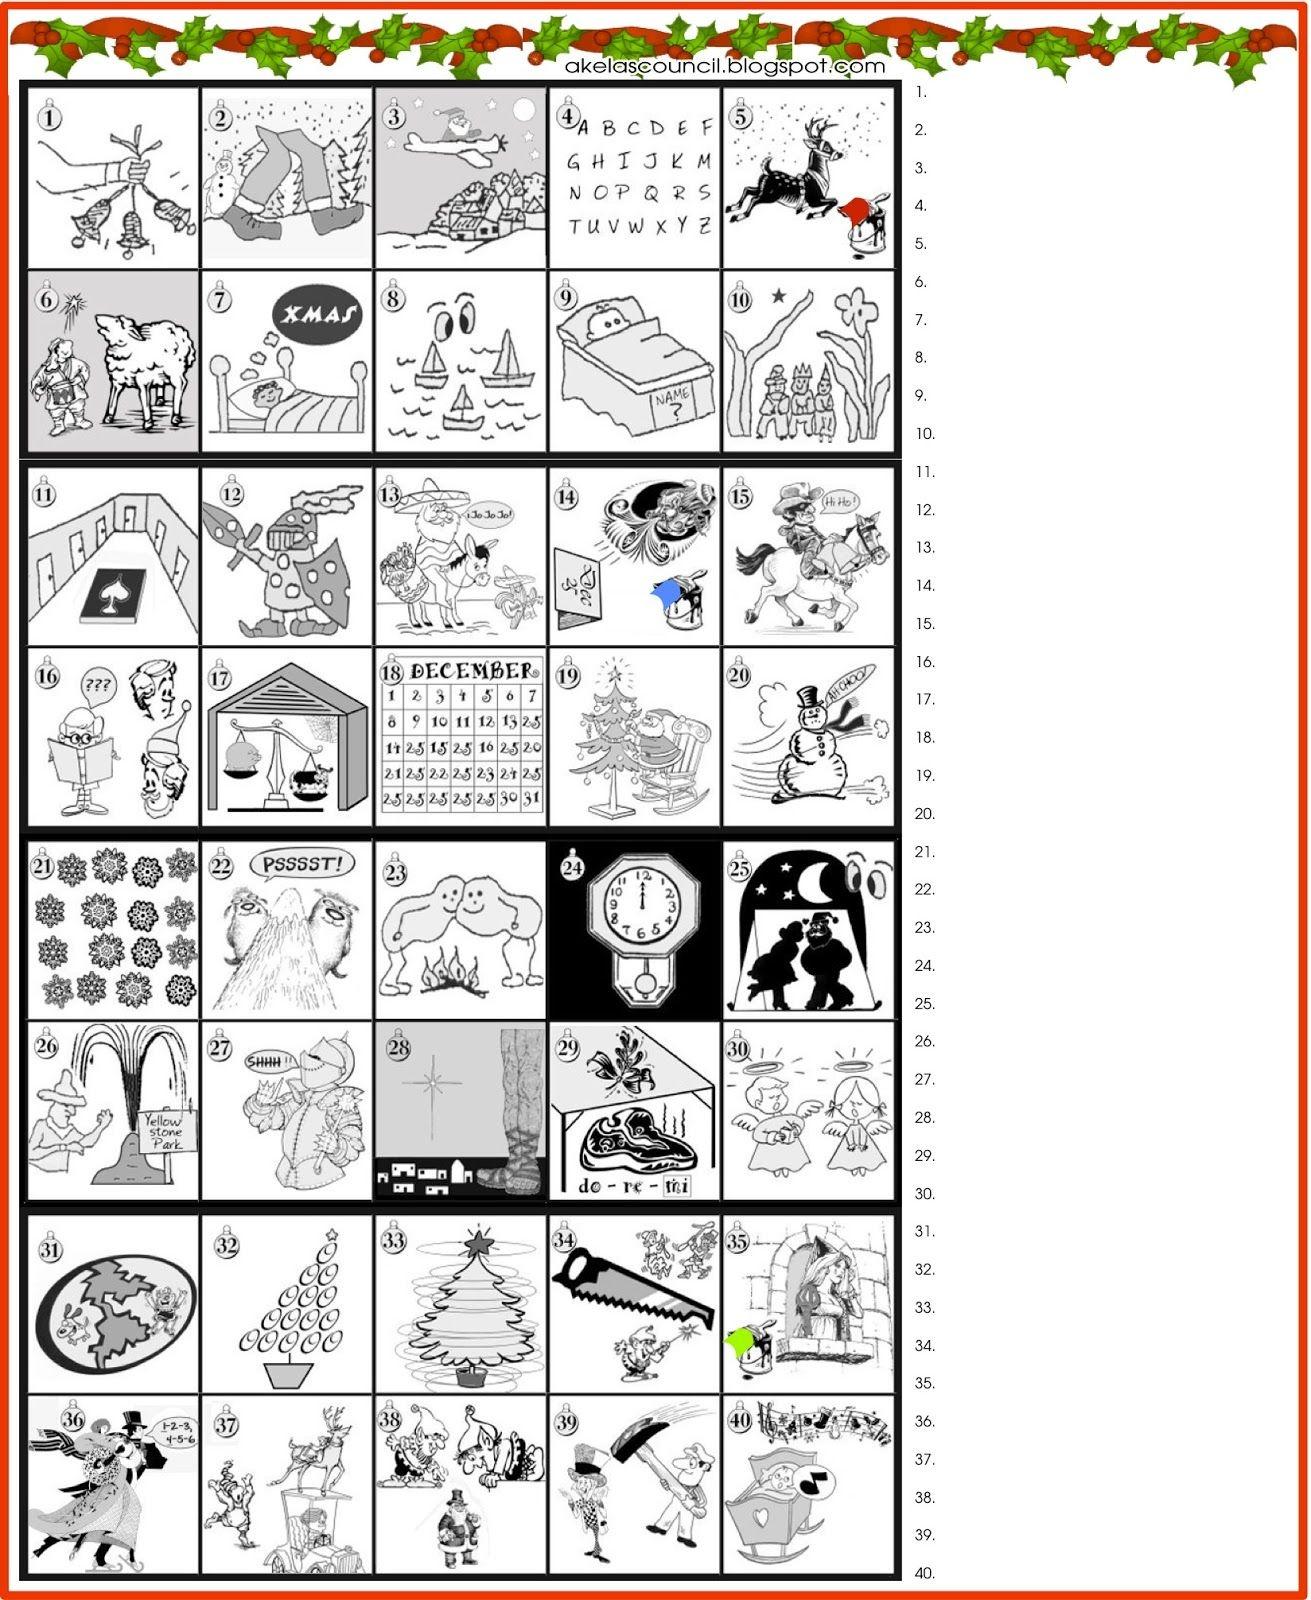 Printable * Guess The Christmas Songs Or Carols Word Puzzle - Free Printable Christmas Song Picture Game